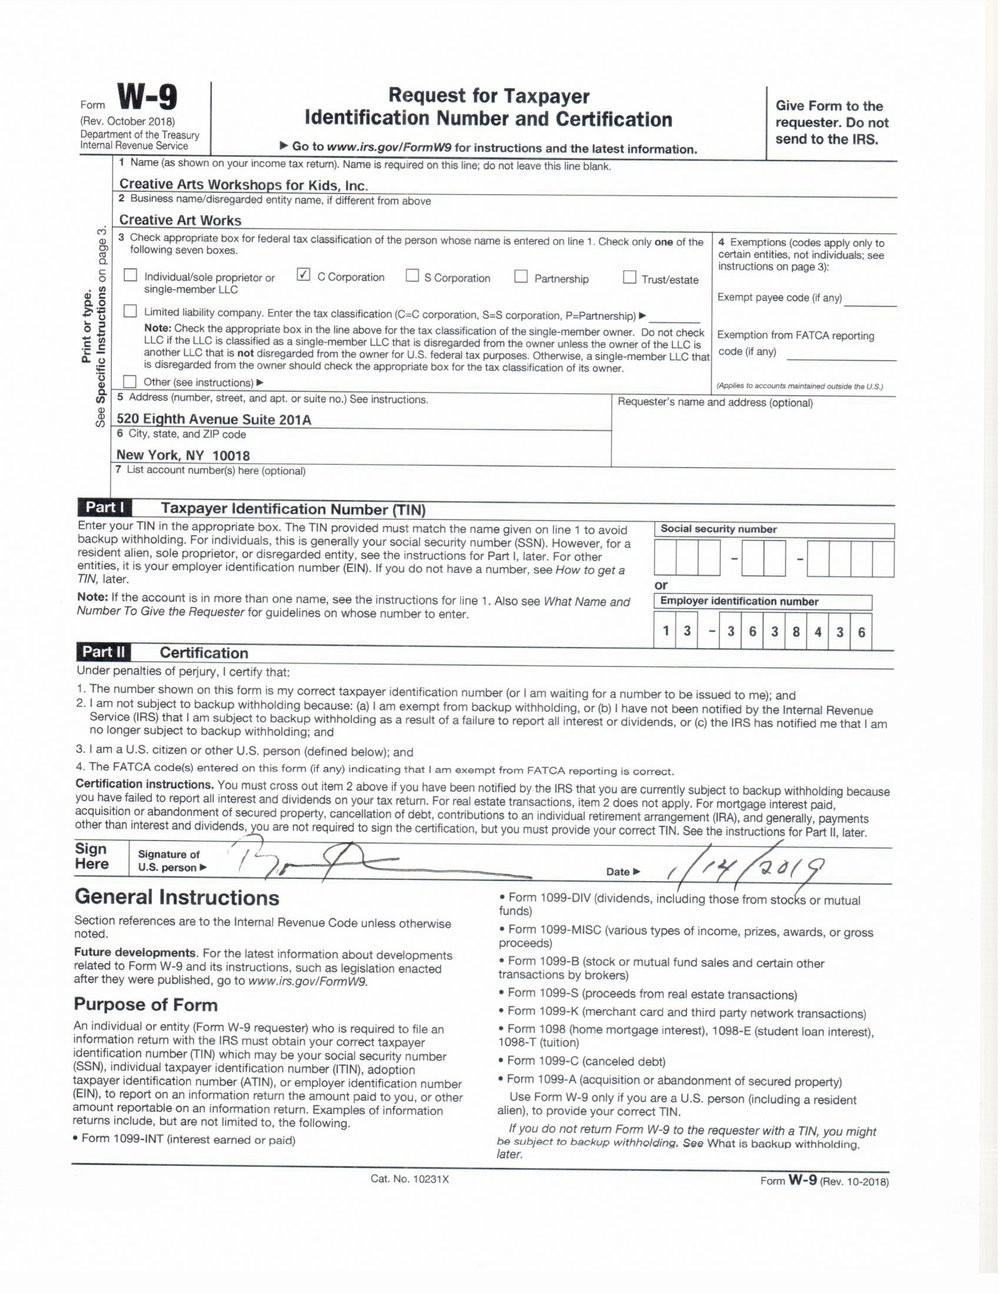 Blank W 9 Form 2020 Printable Free | Calendar Template Printable intended for Printable W-9 Form Free